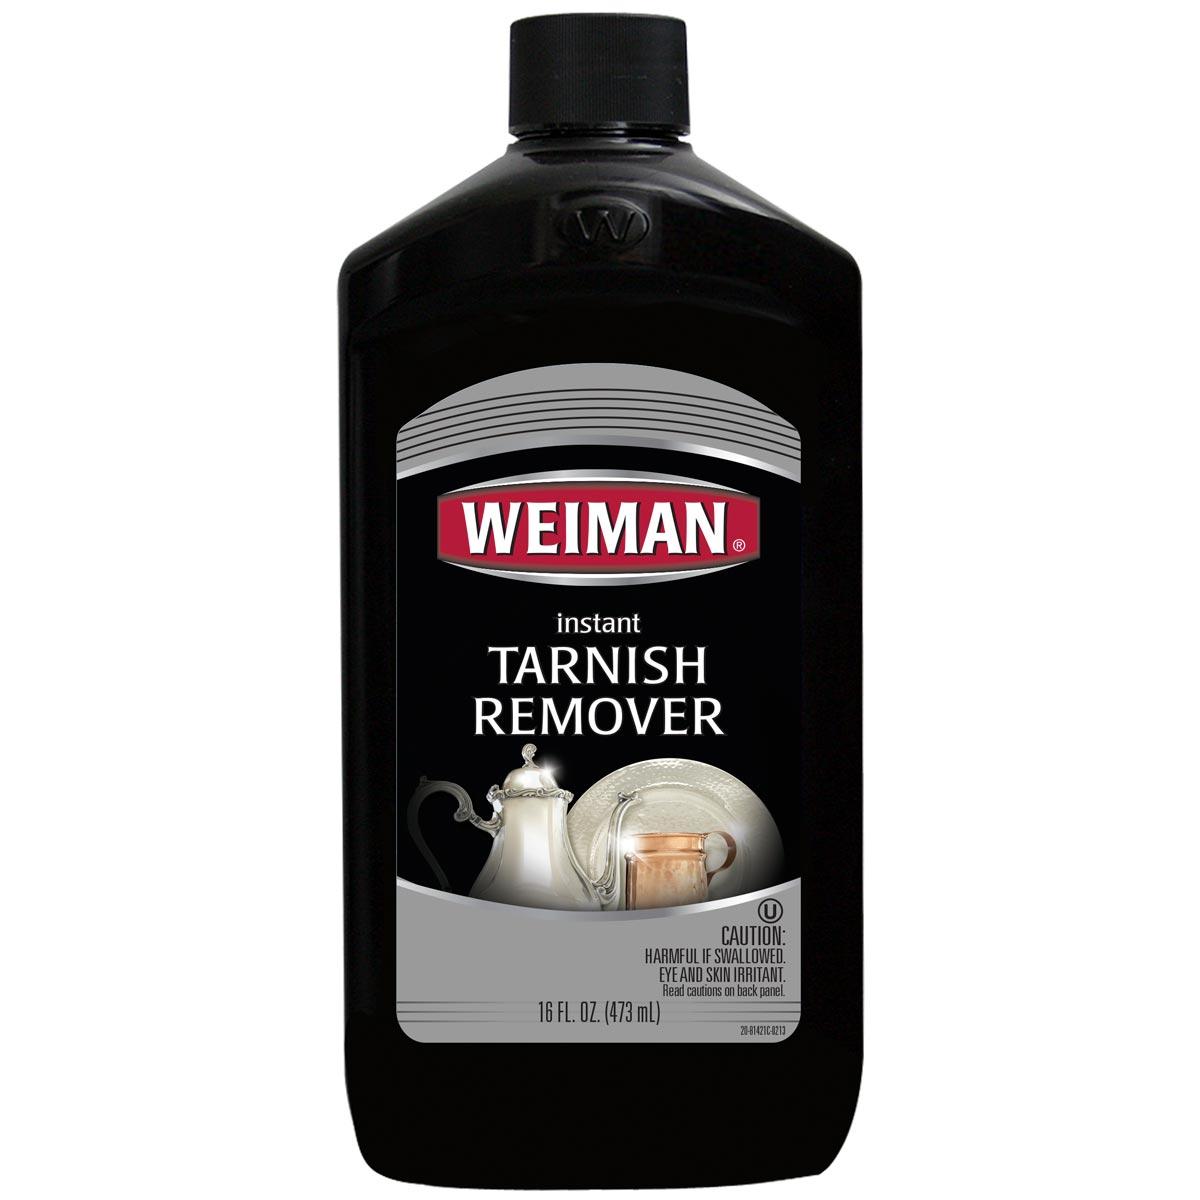 https://googone.com/media/catalog/product/w/e/weiman-instant-tarnish-remover.jpg